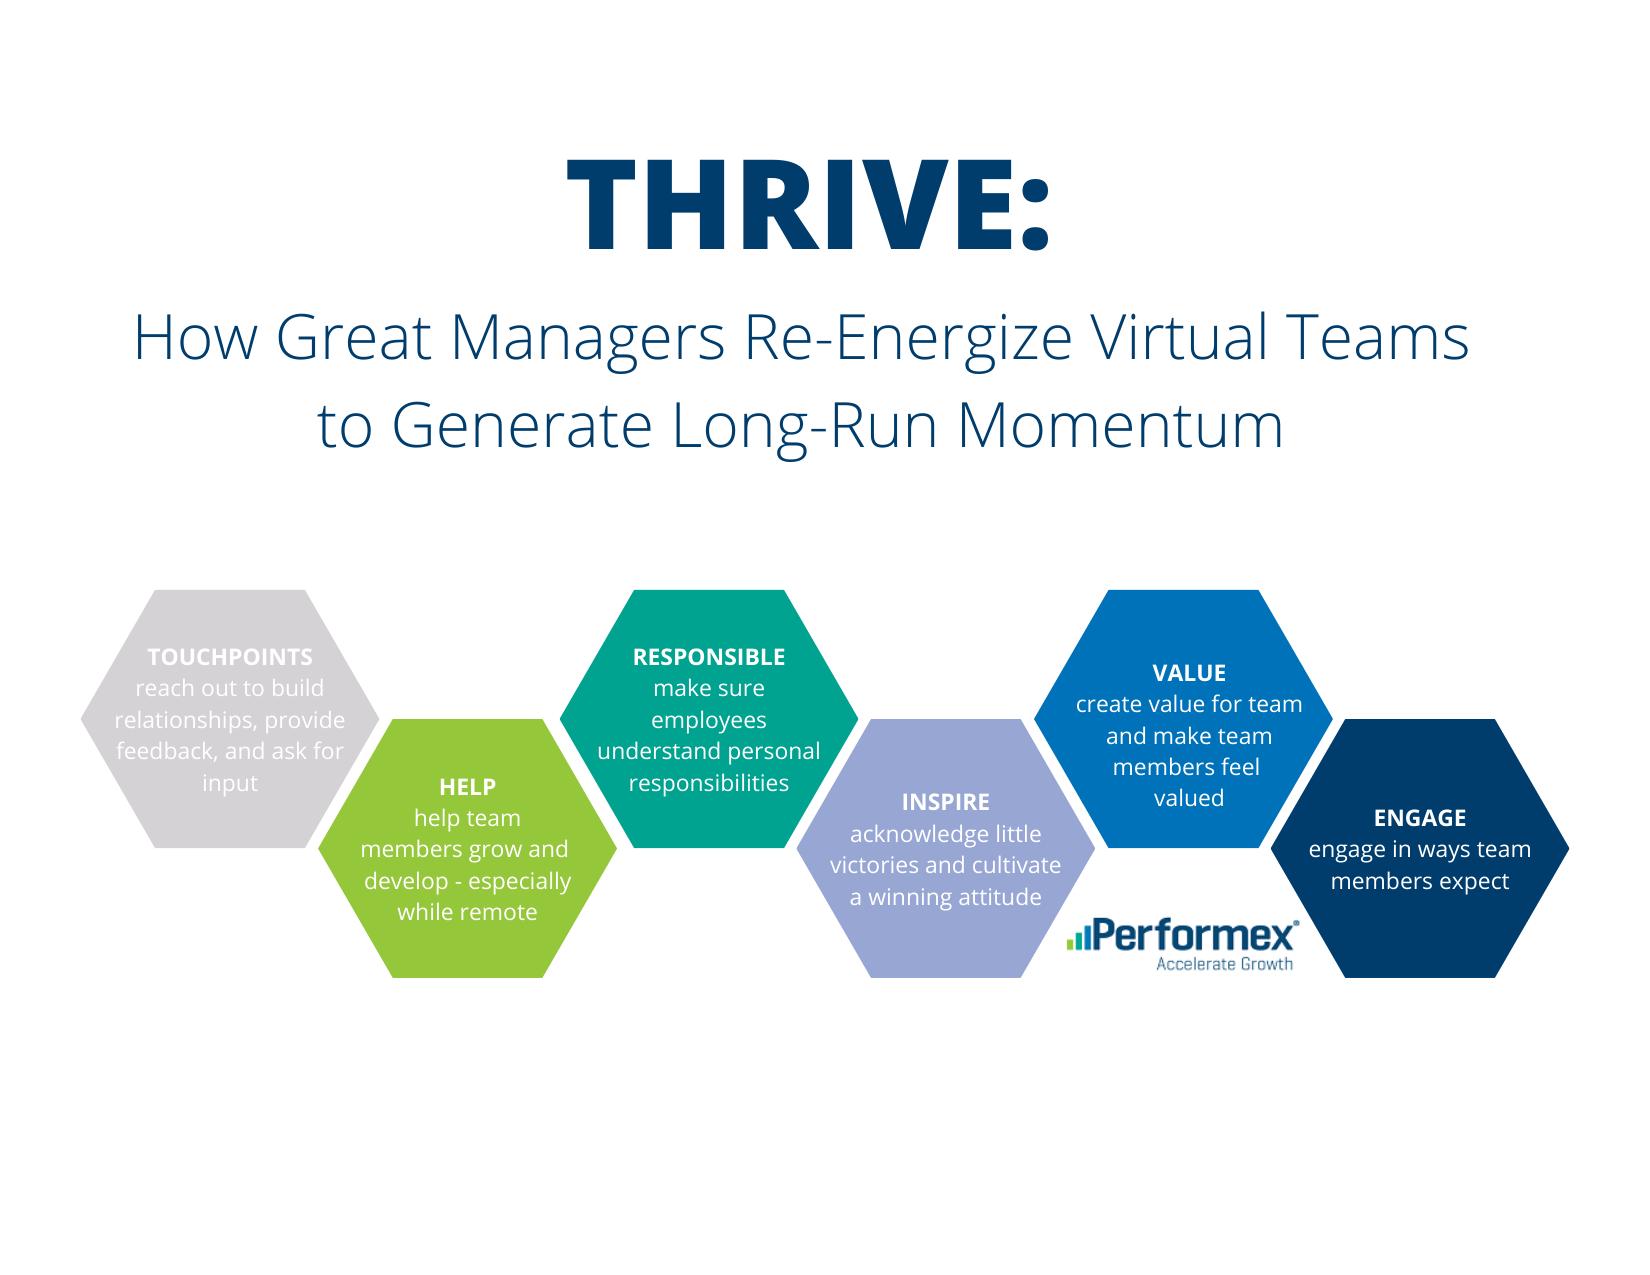 thrive_5